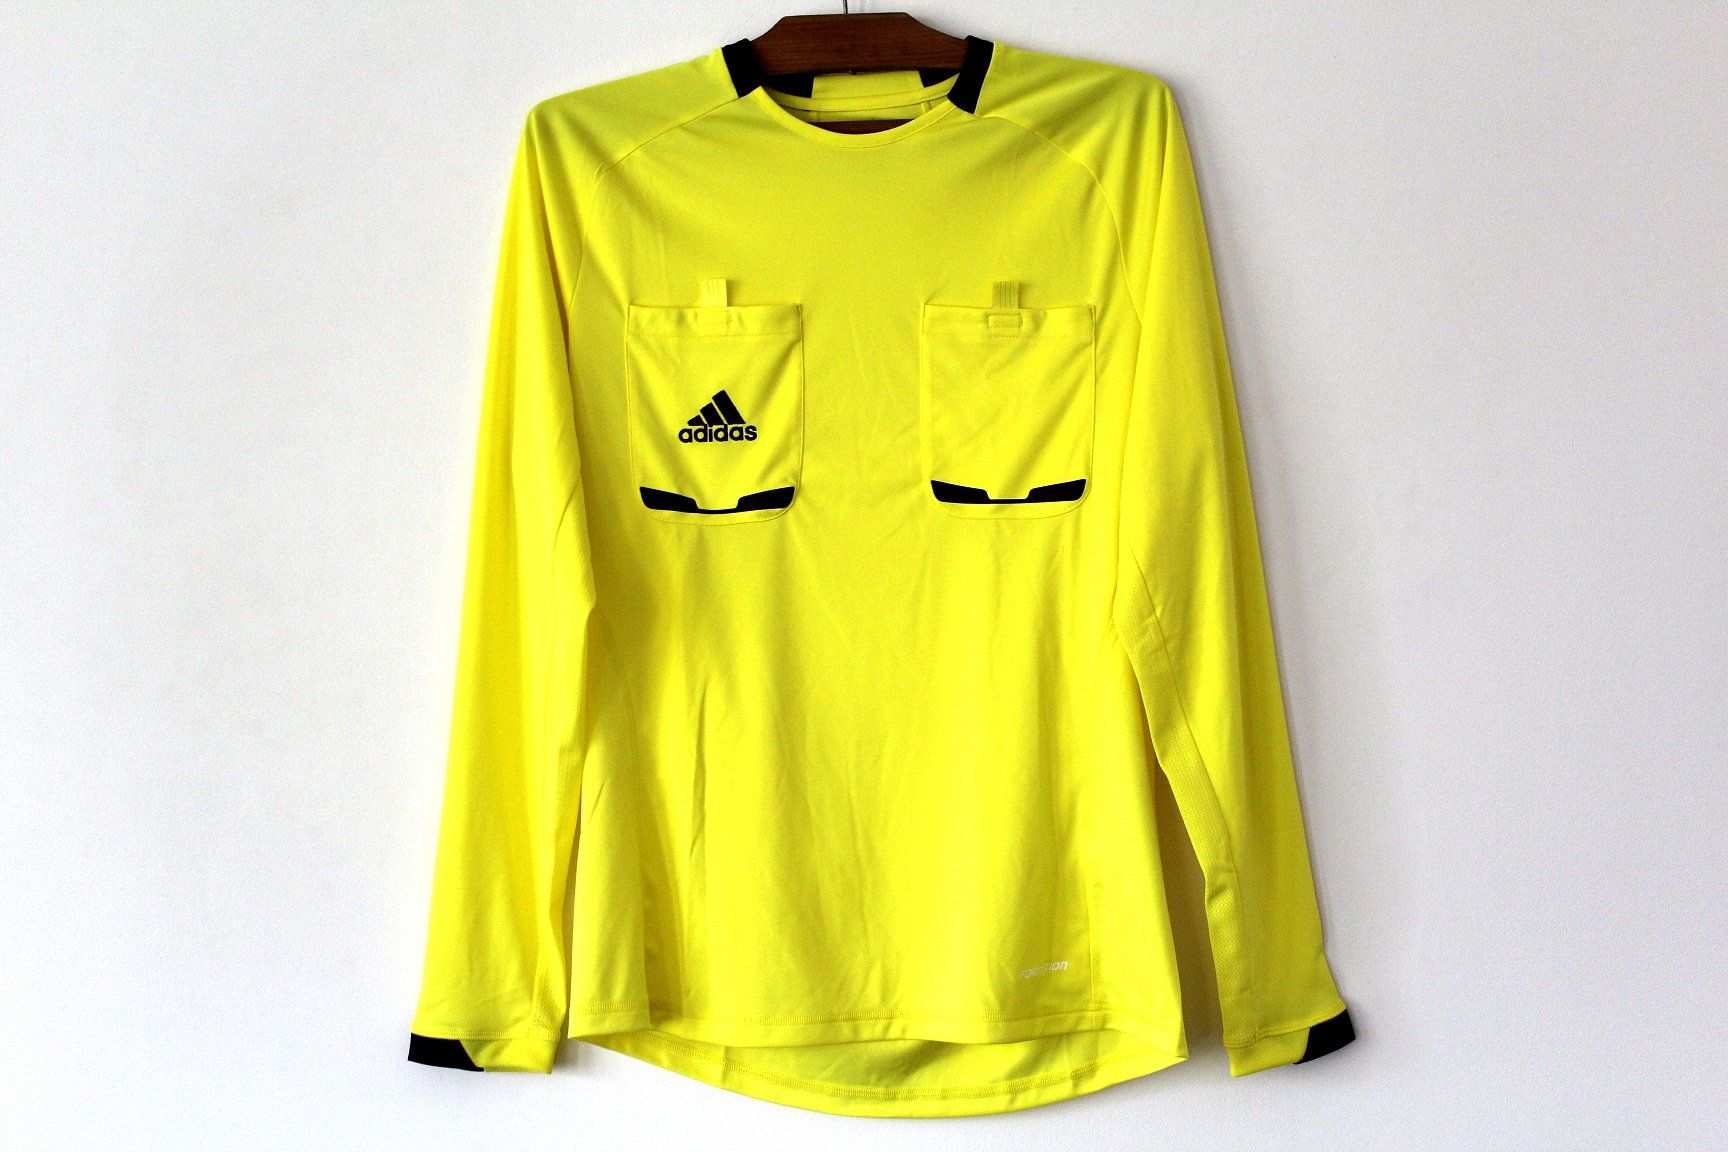 Yellow Adidas Football Shirt Vintage Adidas Soccer Jersey Adidas Football Jersey Very Rare Adidas Training J Yellow Adidas Adidas Sport Pants Vintage Adidas [ 1152 x 1728 Pixel ]